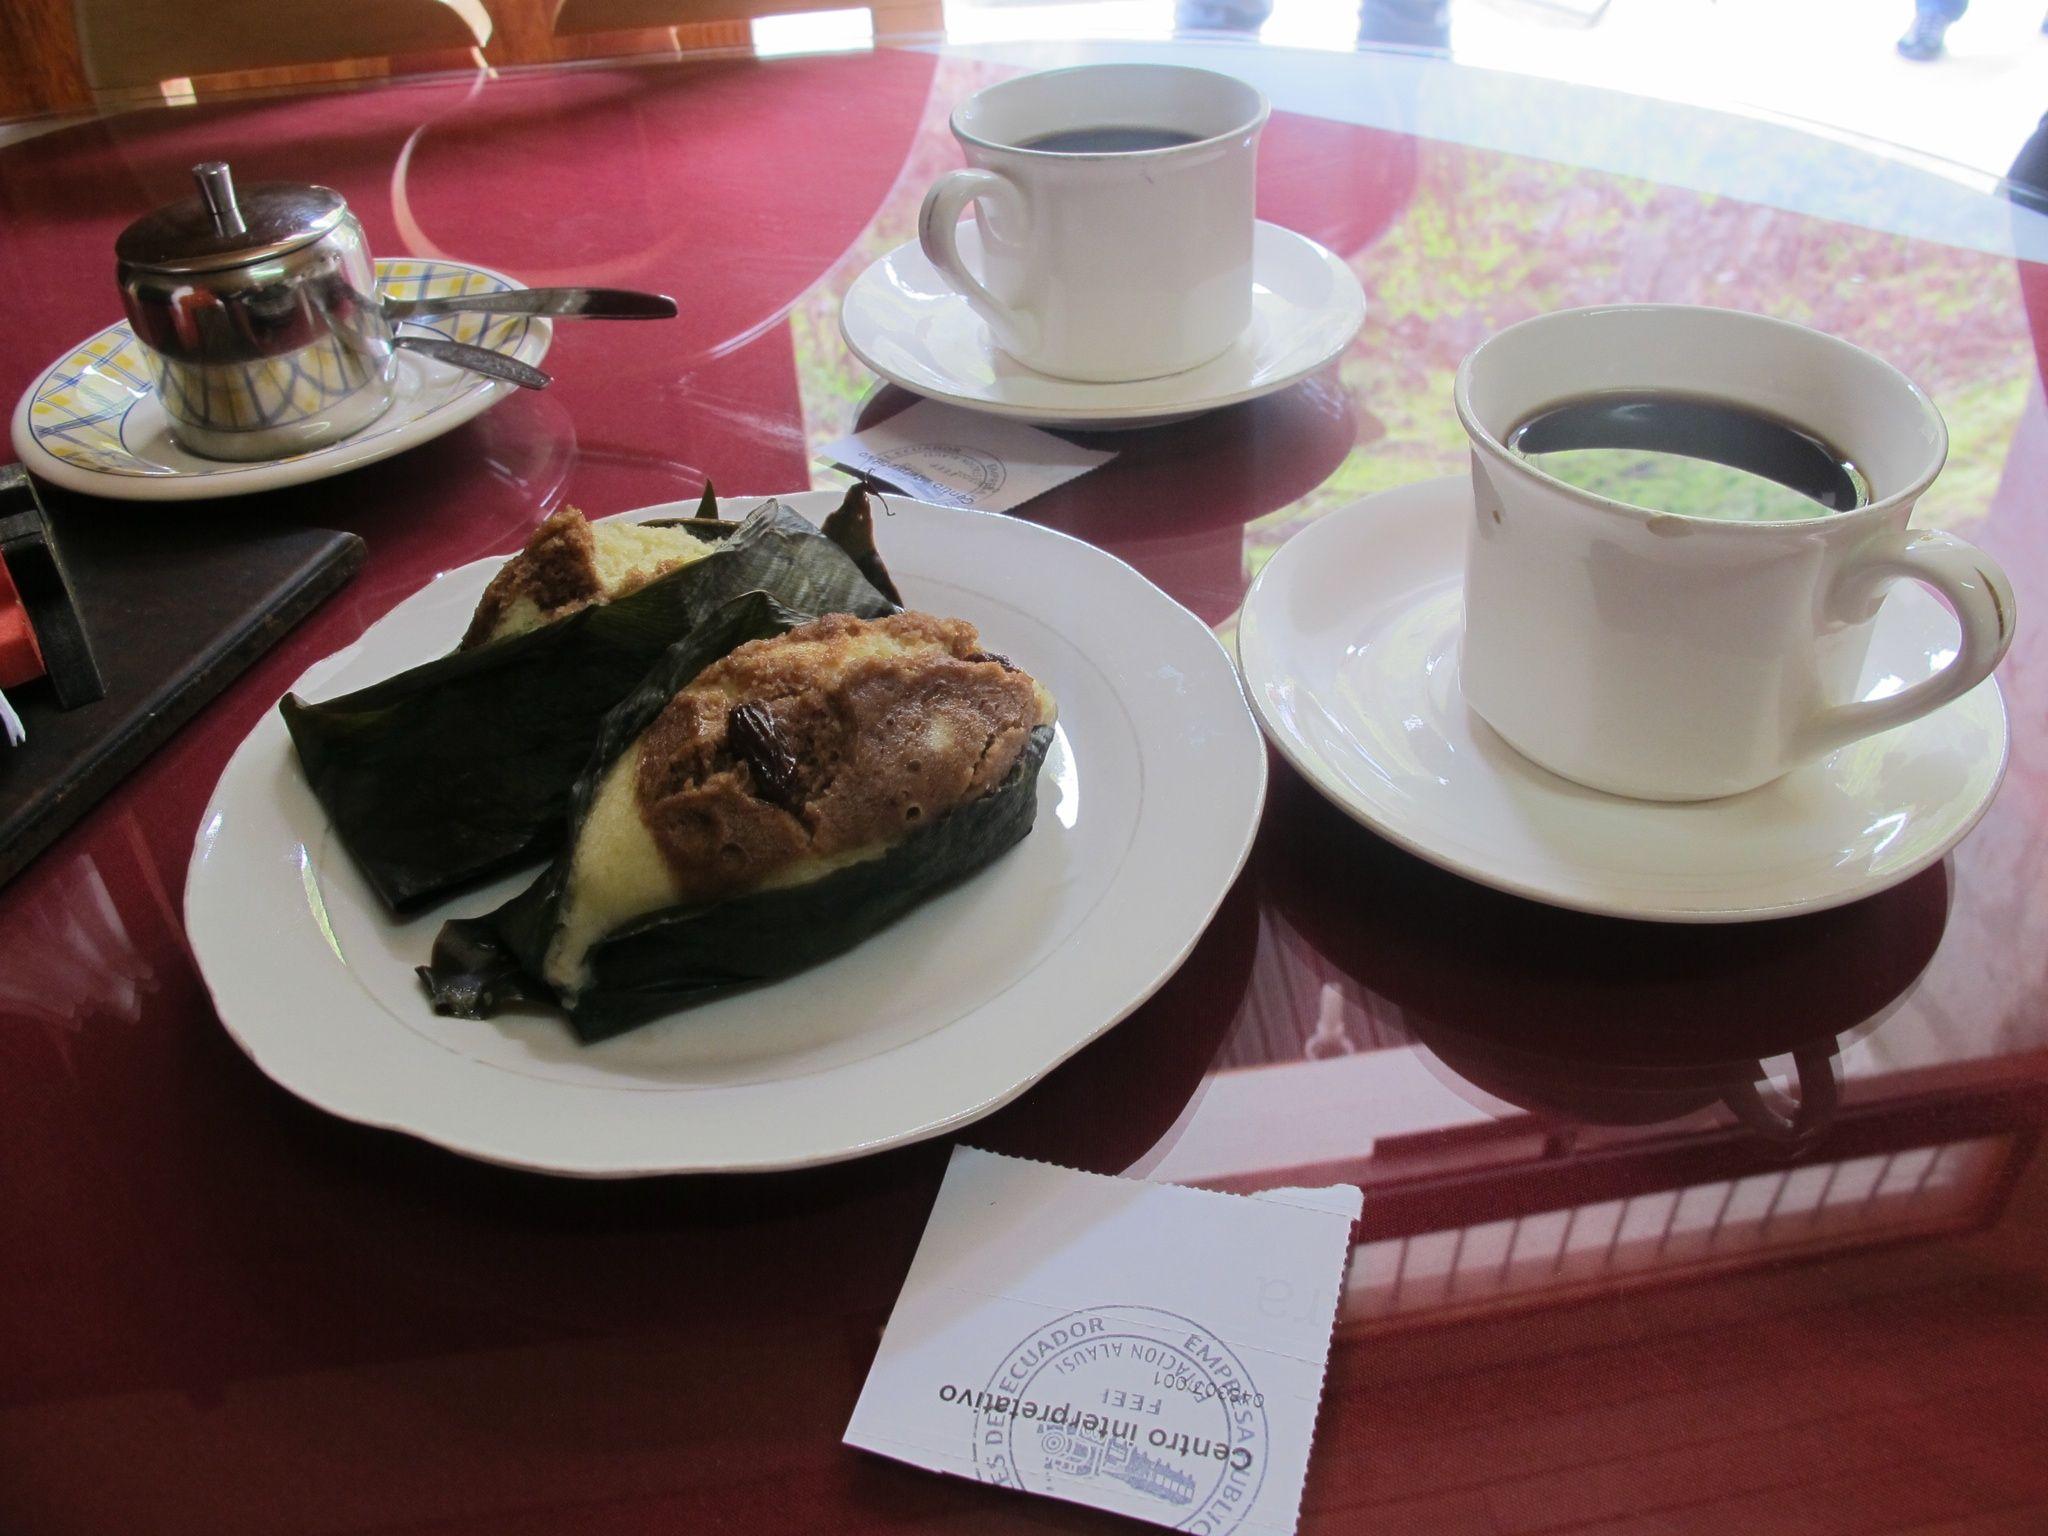 Day 2: Food (Quimbolitos & Coffee in Ecuador)